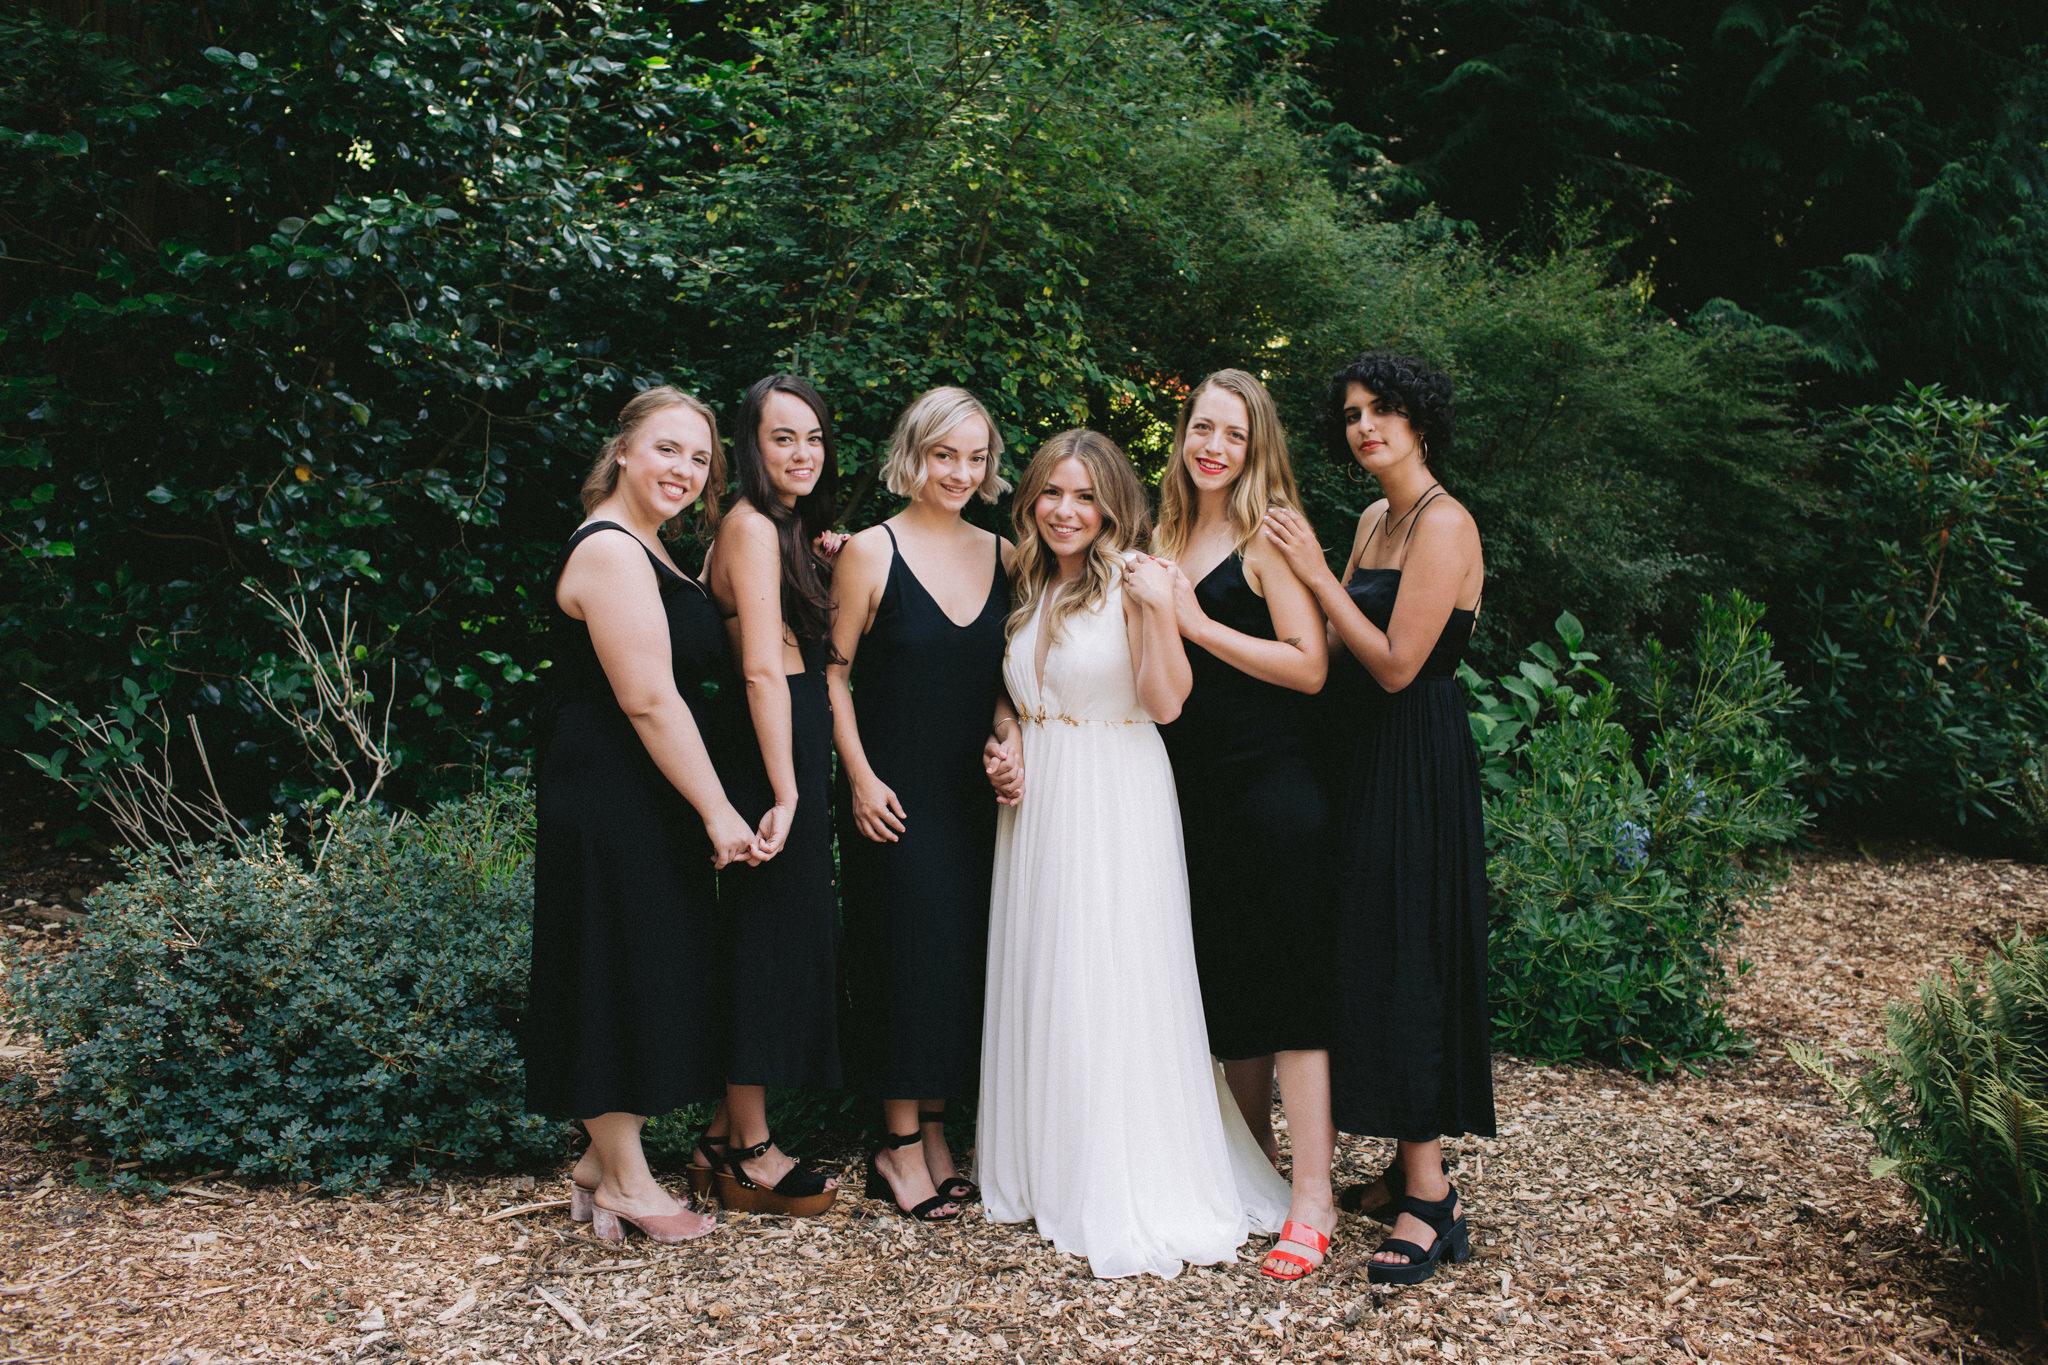 Backyard-Bainbridge-Island-Wedding-Alycia-Lovell-Photography-58.JPG